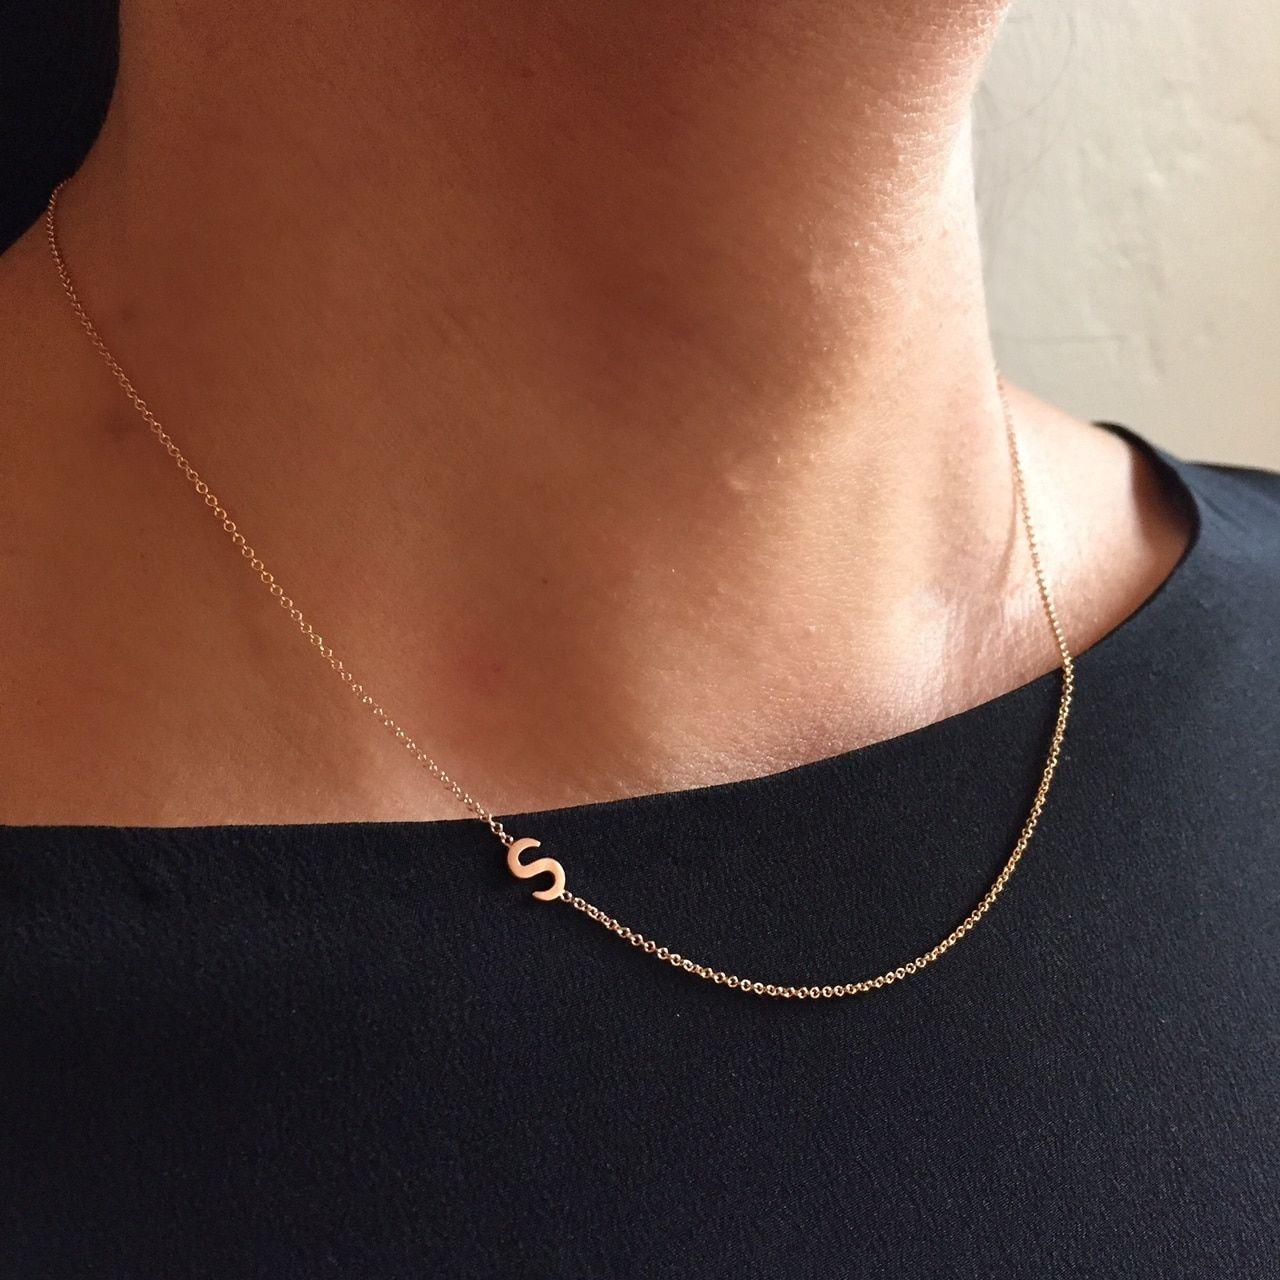 14k Gold Asymmetrical Initial Necklace Sideways Initial Necklace Initial Necklace 14k Gold Initial Necklace